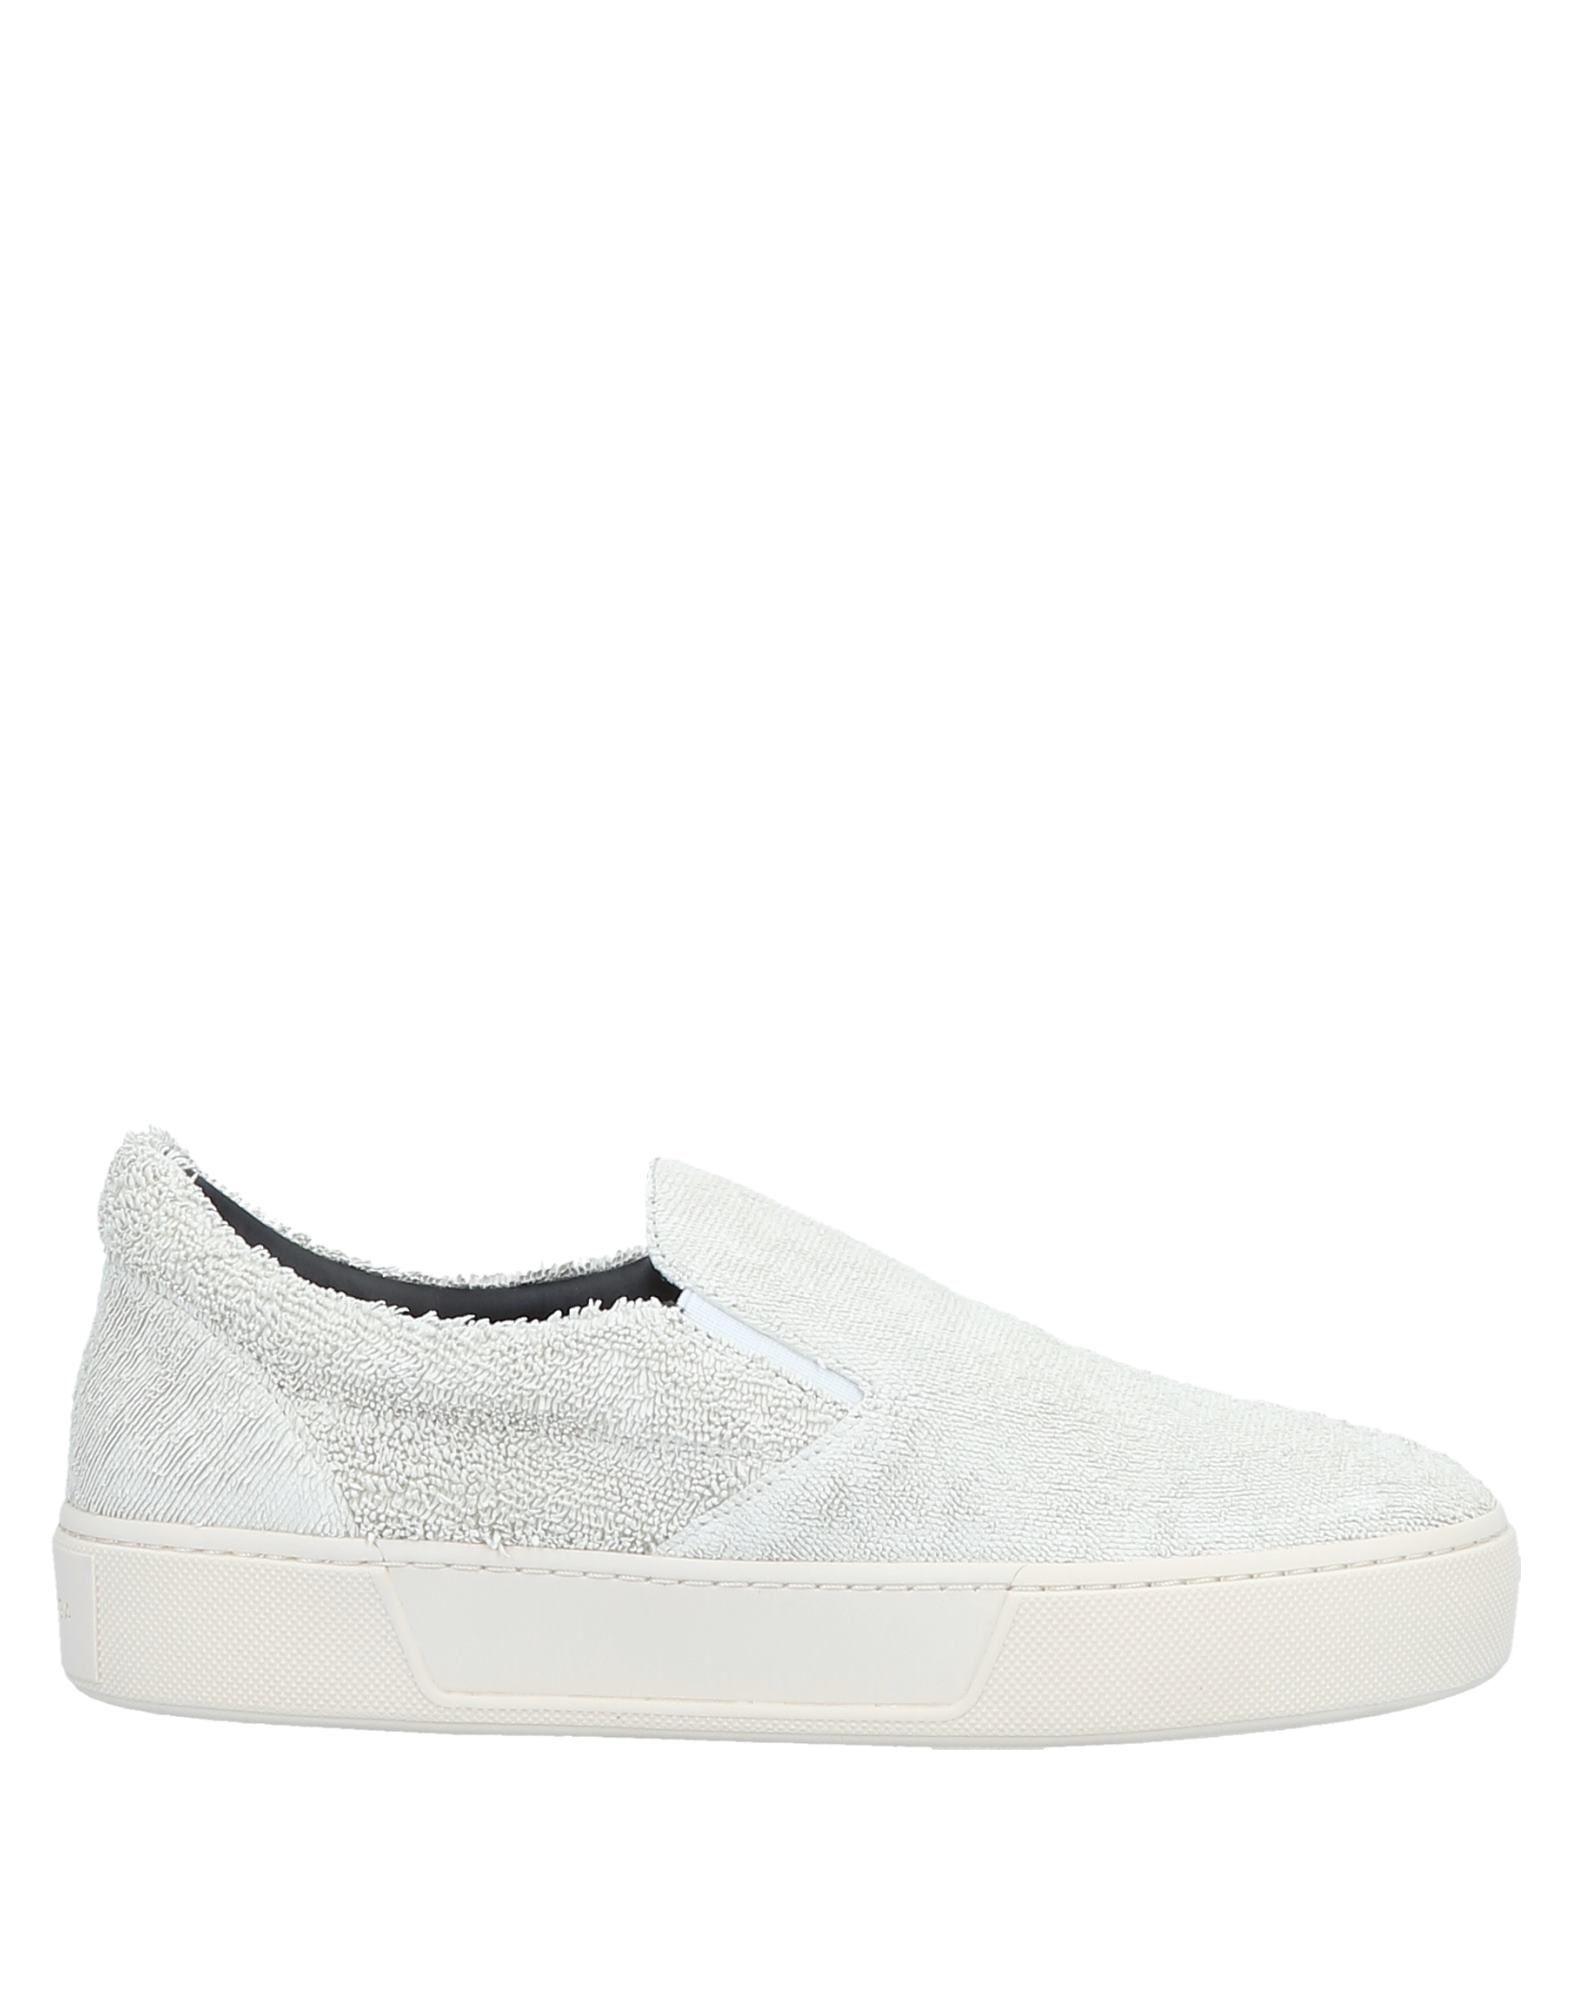 Balenciaga Sneakers - Australia Women Balenciaga Sneakers online on  Australia - - 11570754RR 479ee3